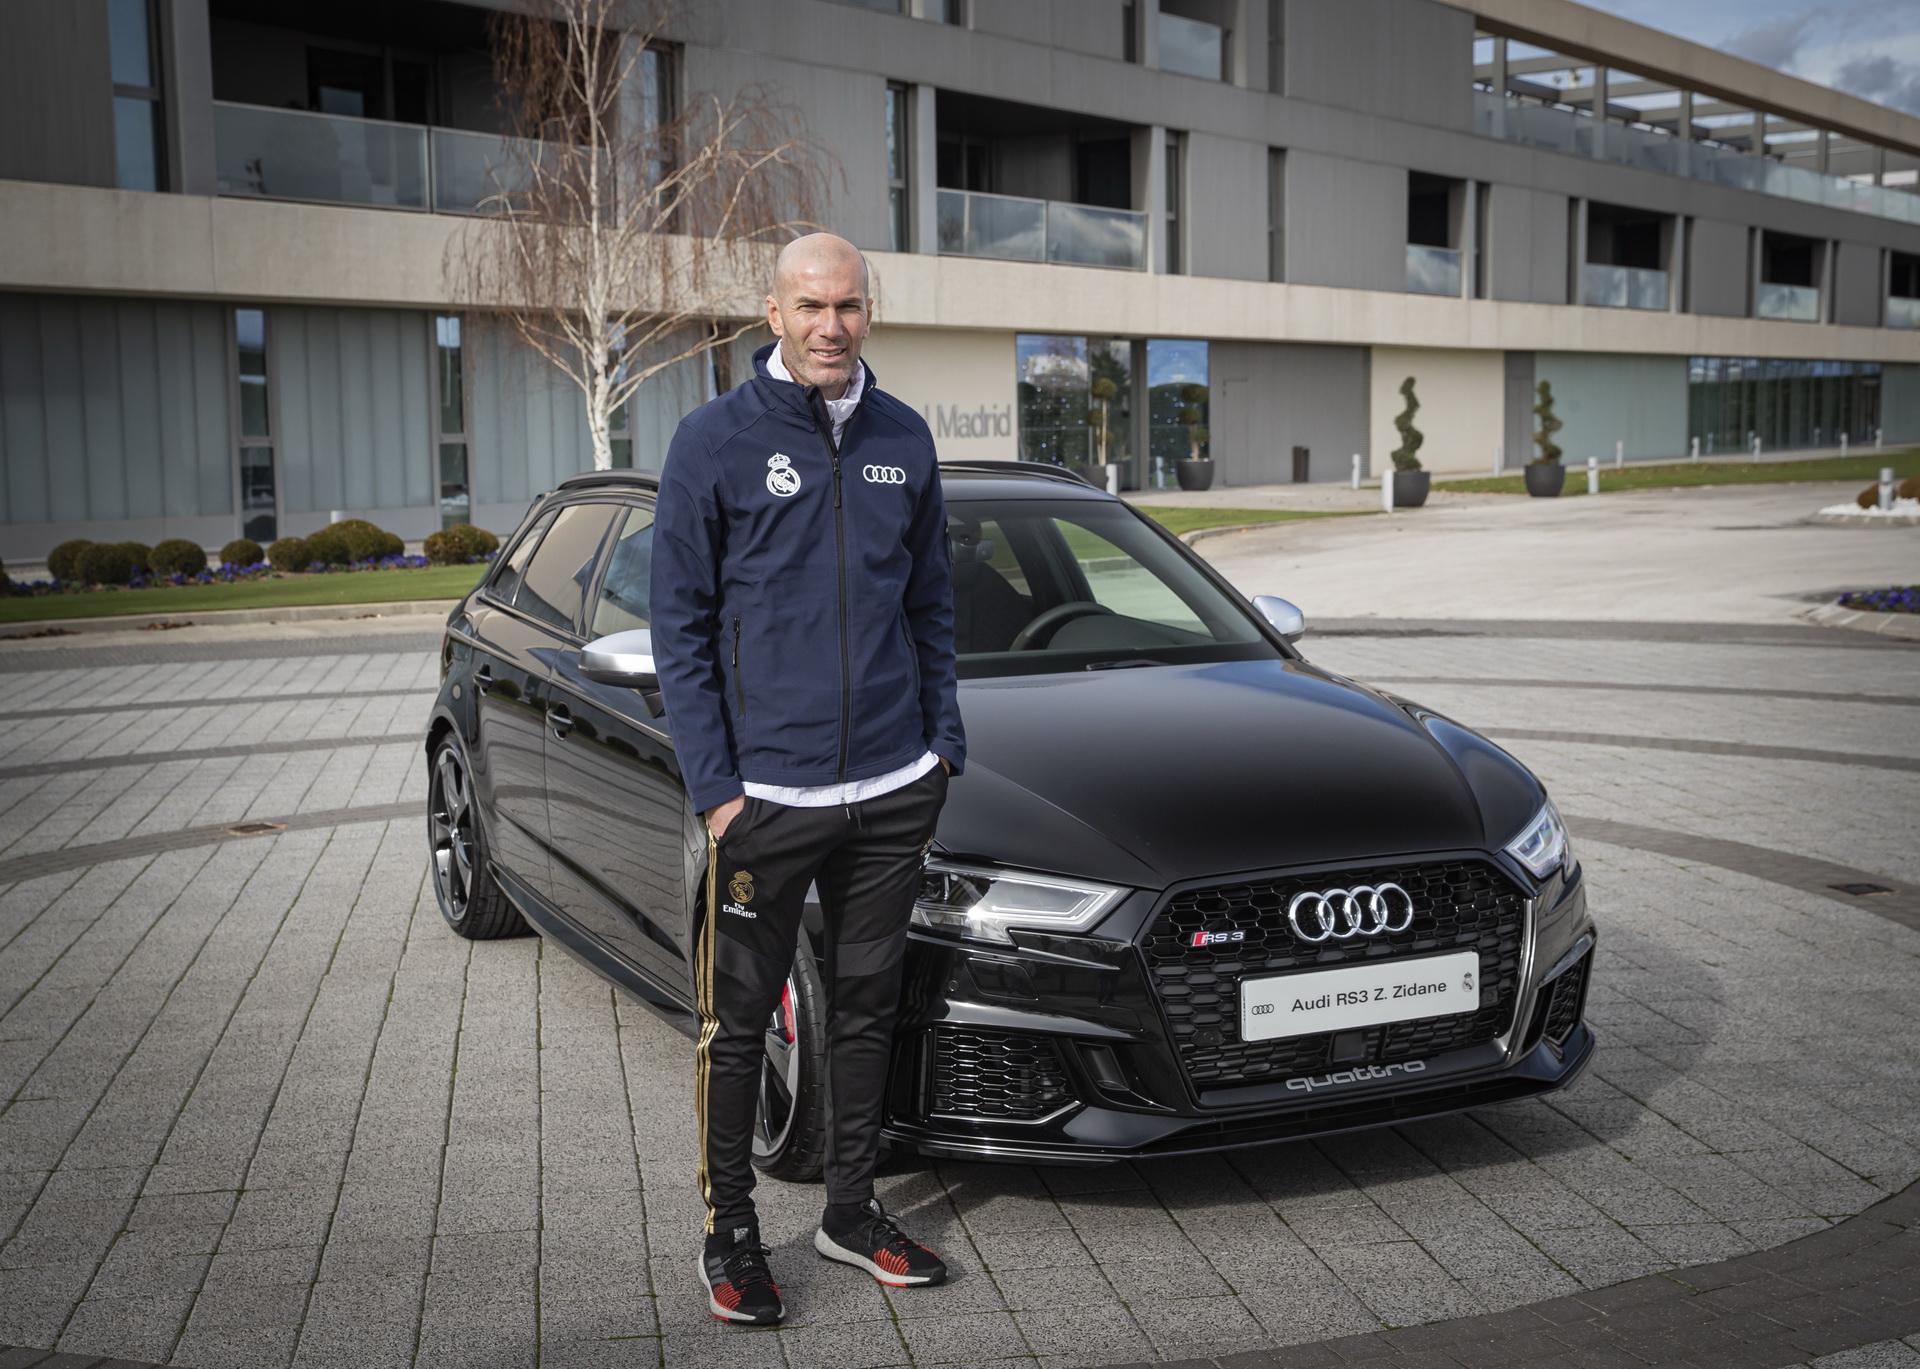 Real_Madrid_Players_Audi_0005